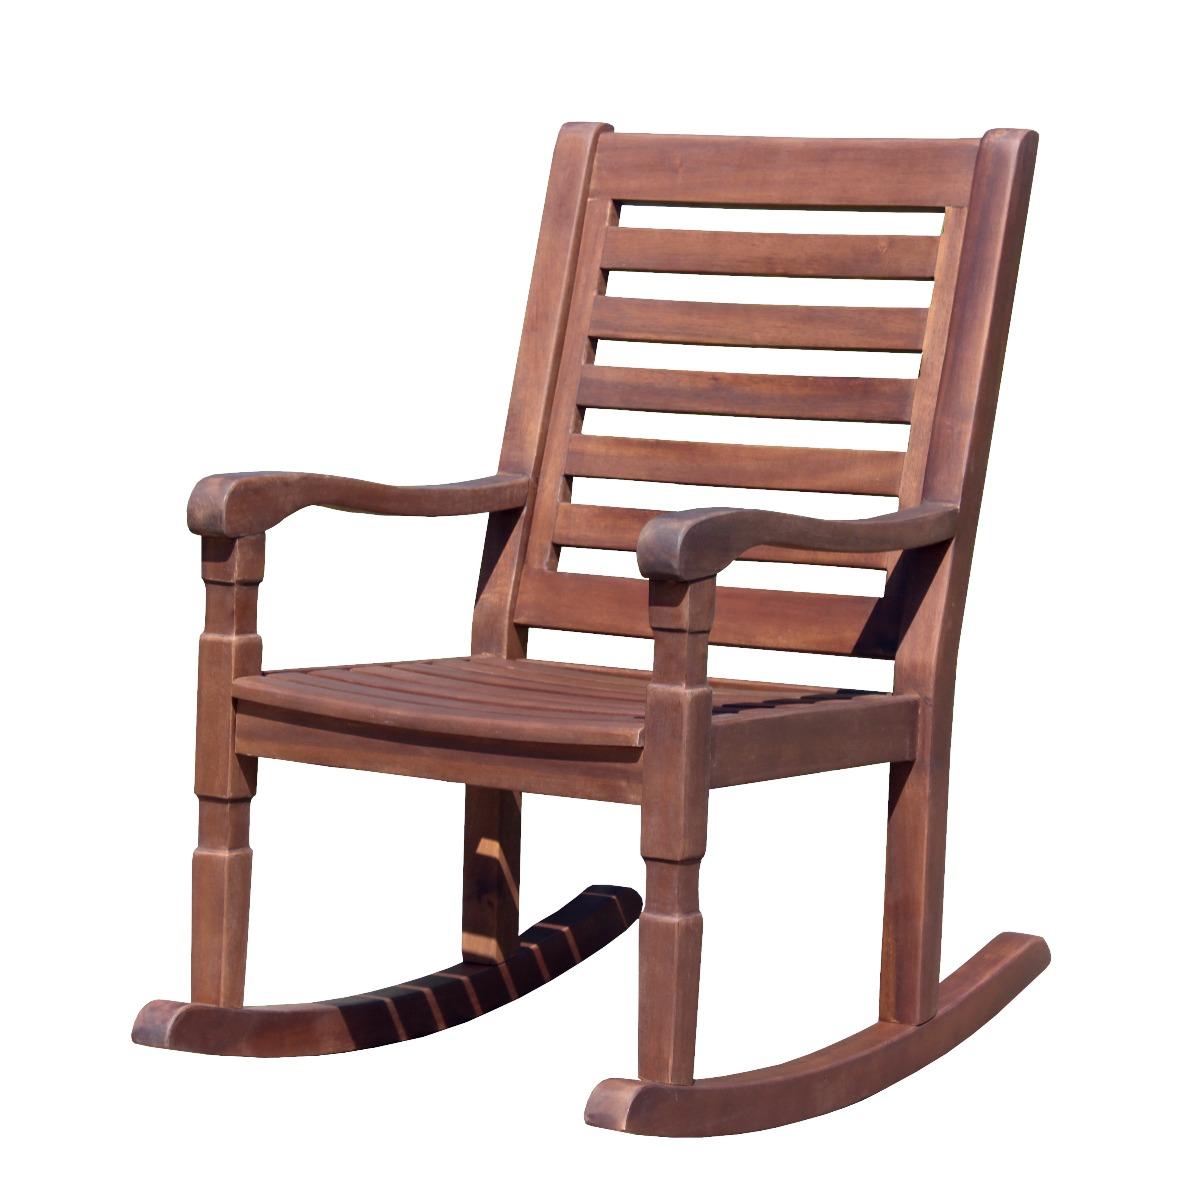 Nantucket Kid's Rocking Chair - Turtleplay ROK0170114910